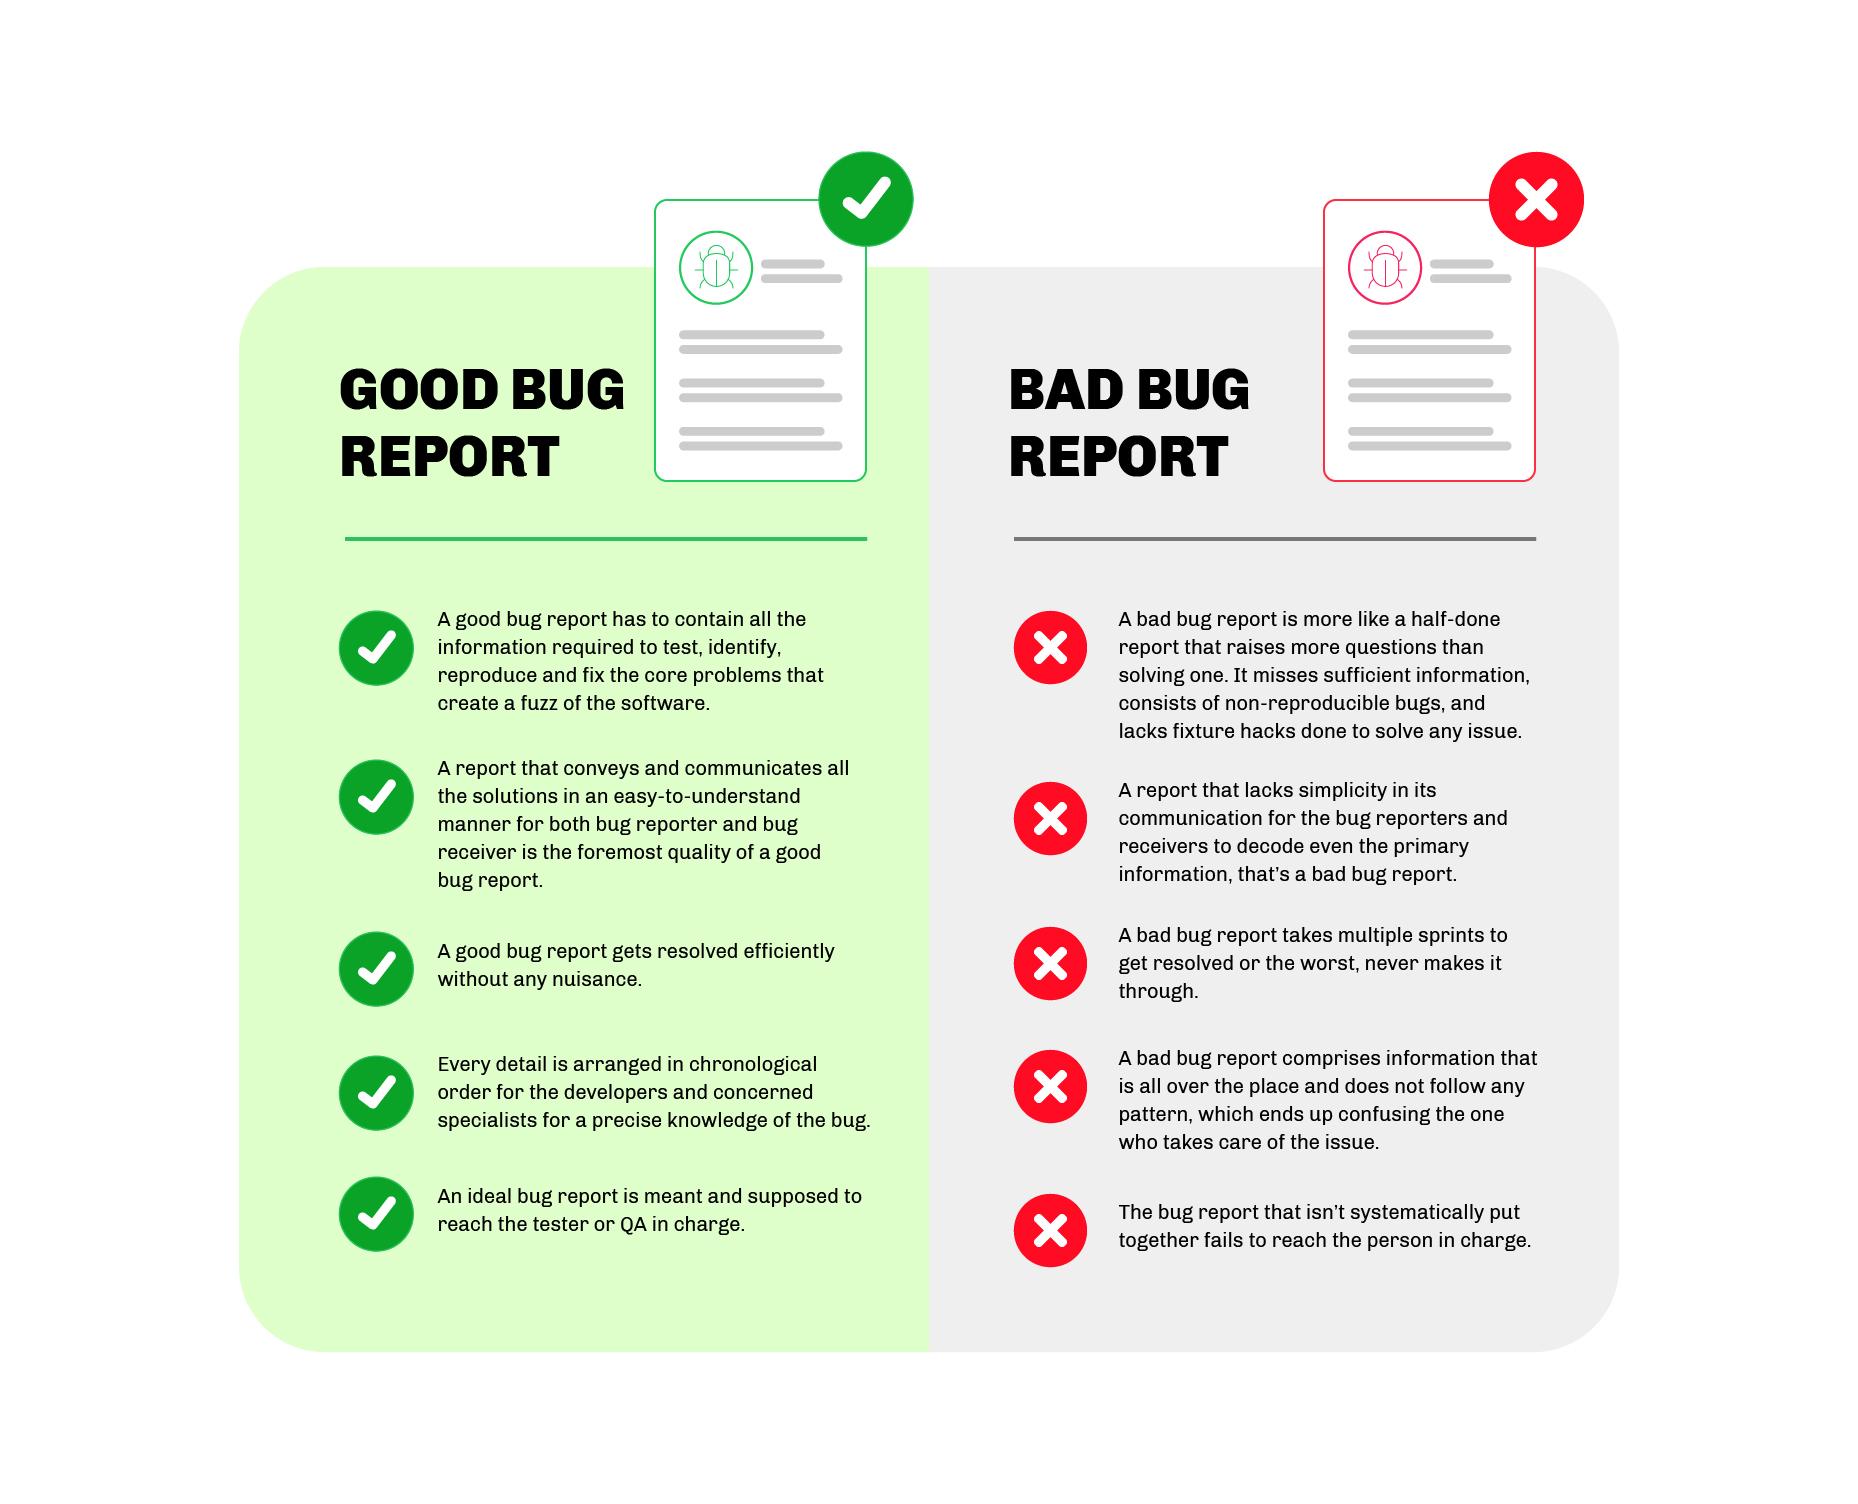 good bug report vs bad bug report